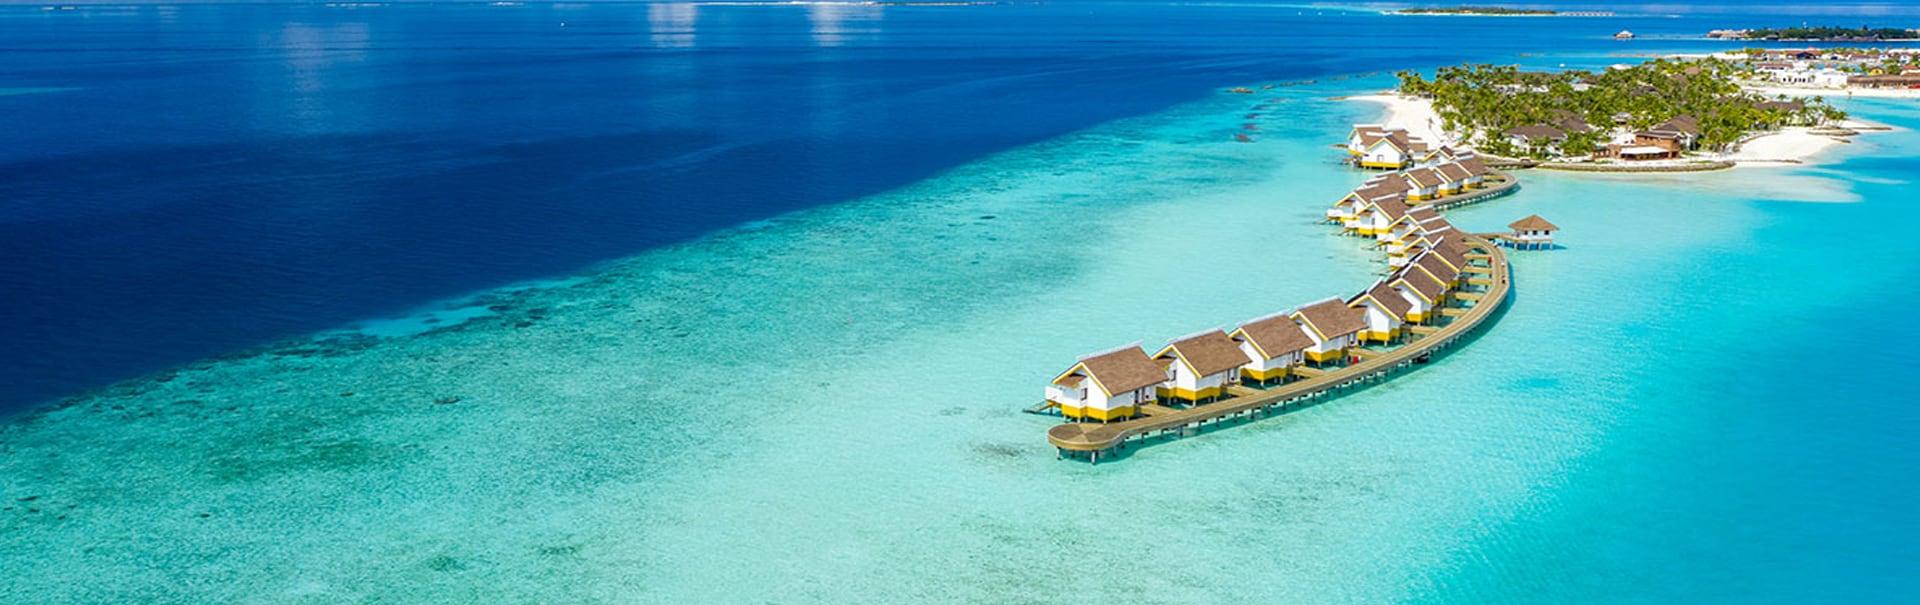 SAii Lagoon by Hilton 5 star (SHML23) Banner